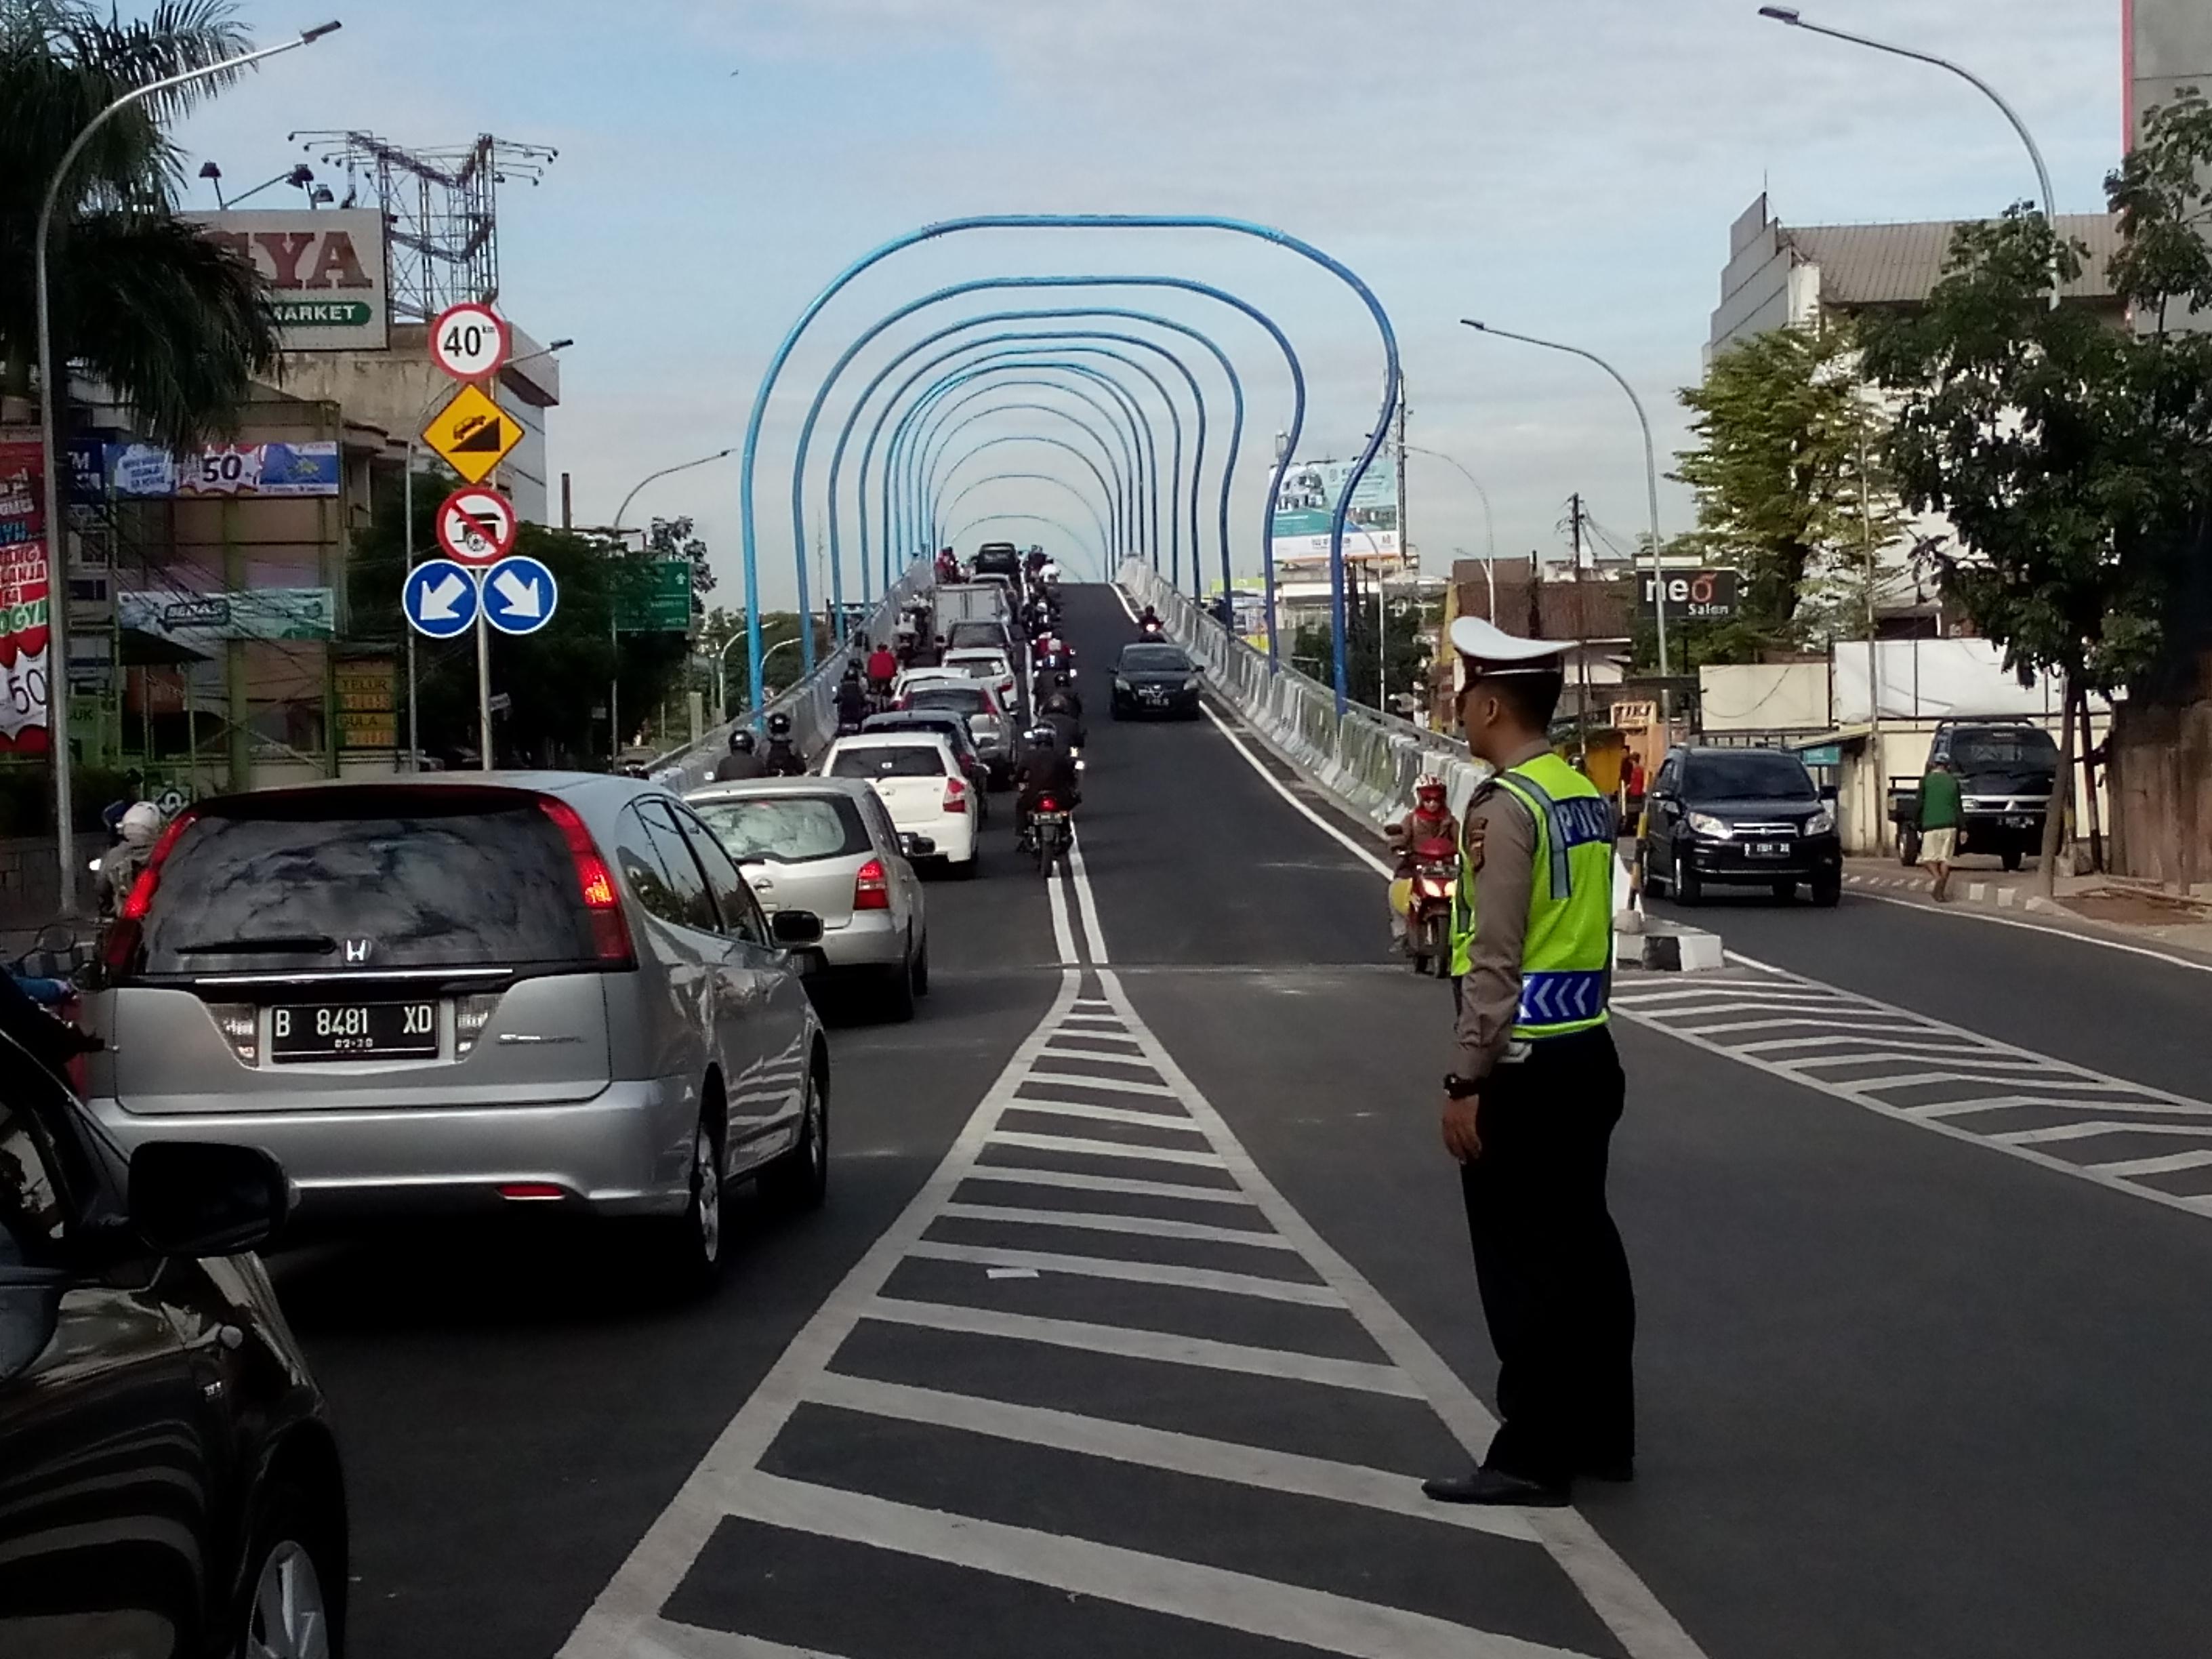 Jembatan Pelangi Jilid Dua akan Hadir di Bandung